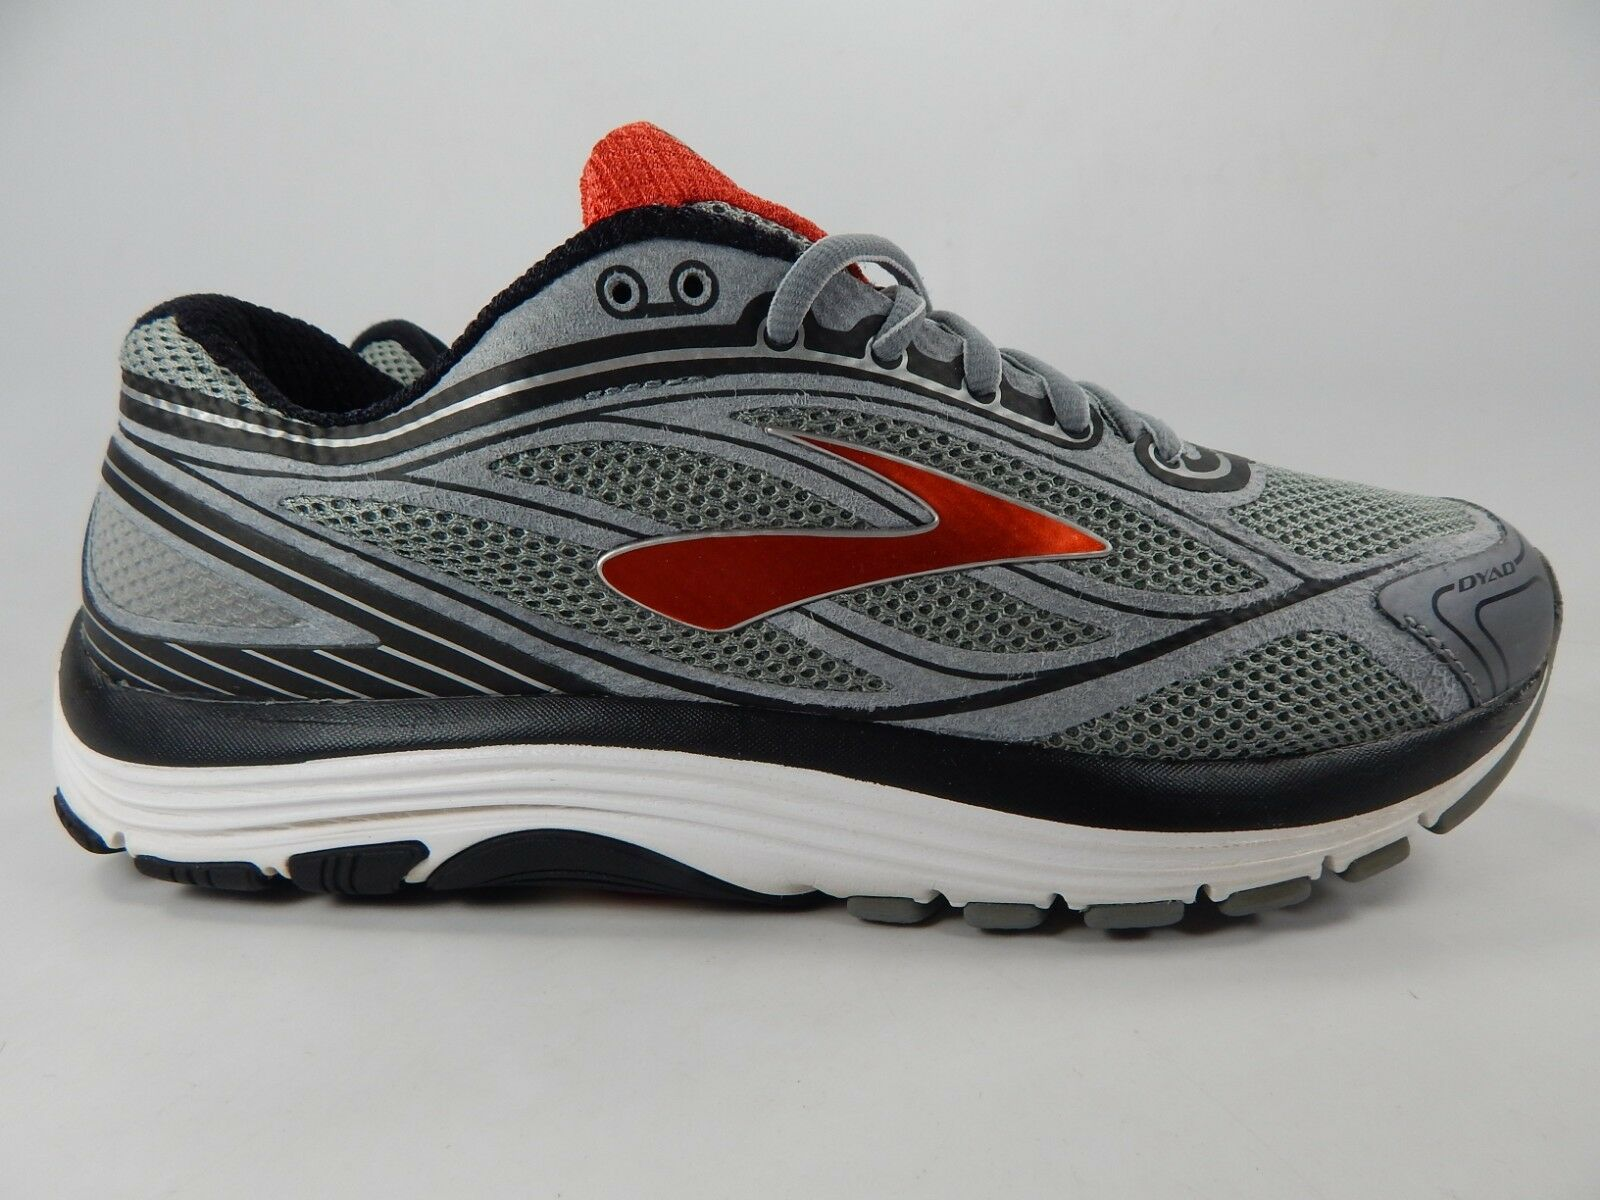 Brooks Dyad 9 tamaño nos 9.5 m (D) Para hombres Zapatos para Correr gris Rojo 1102311D035